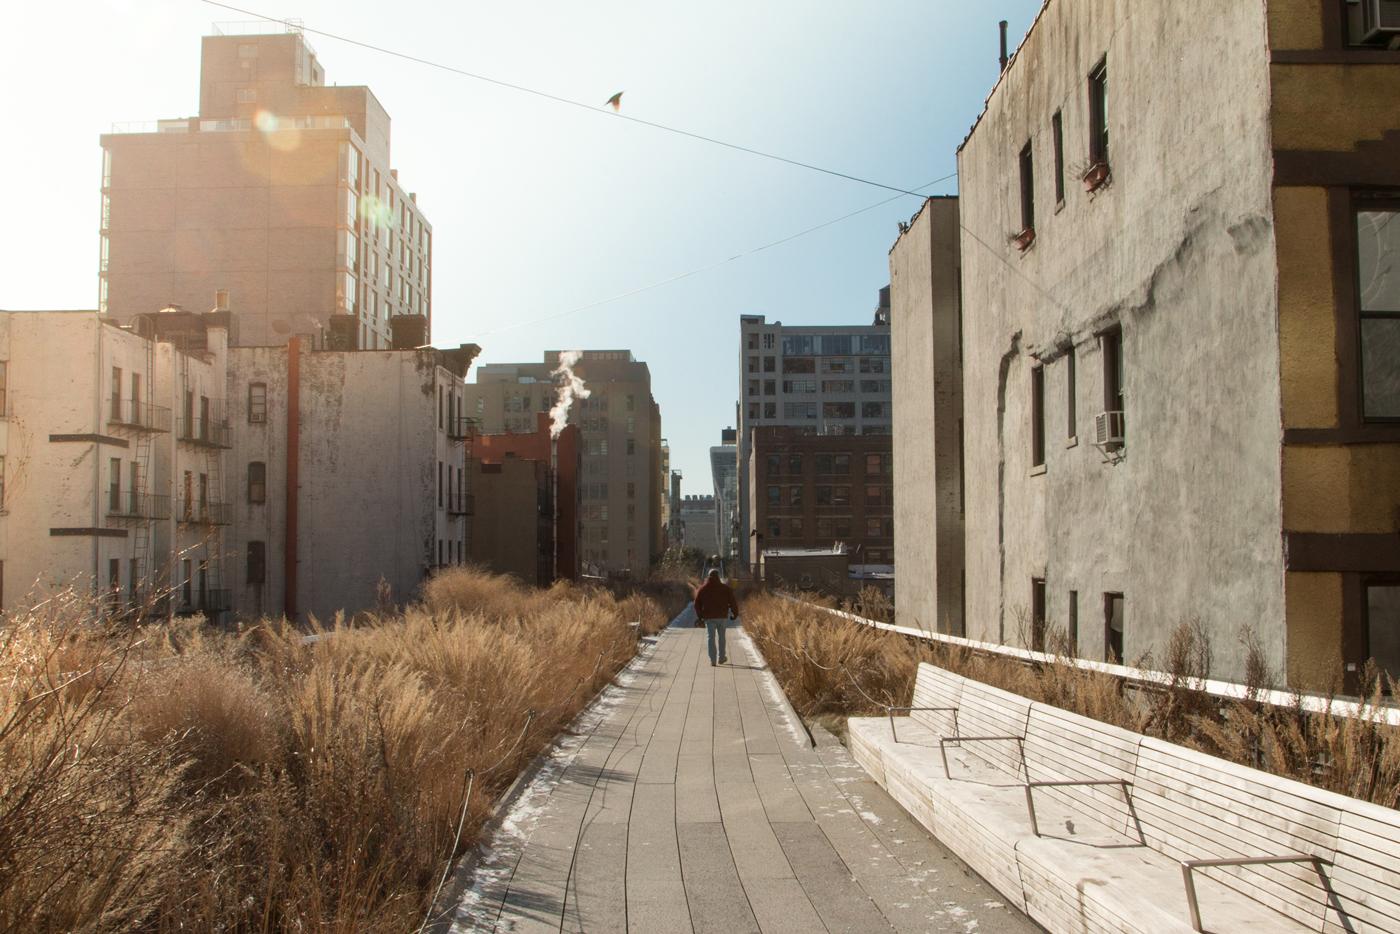 Walking through High Line Park